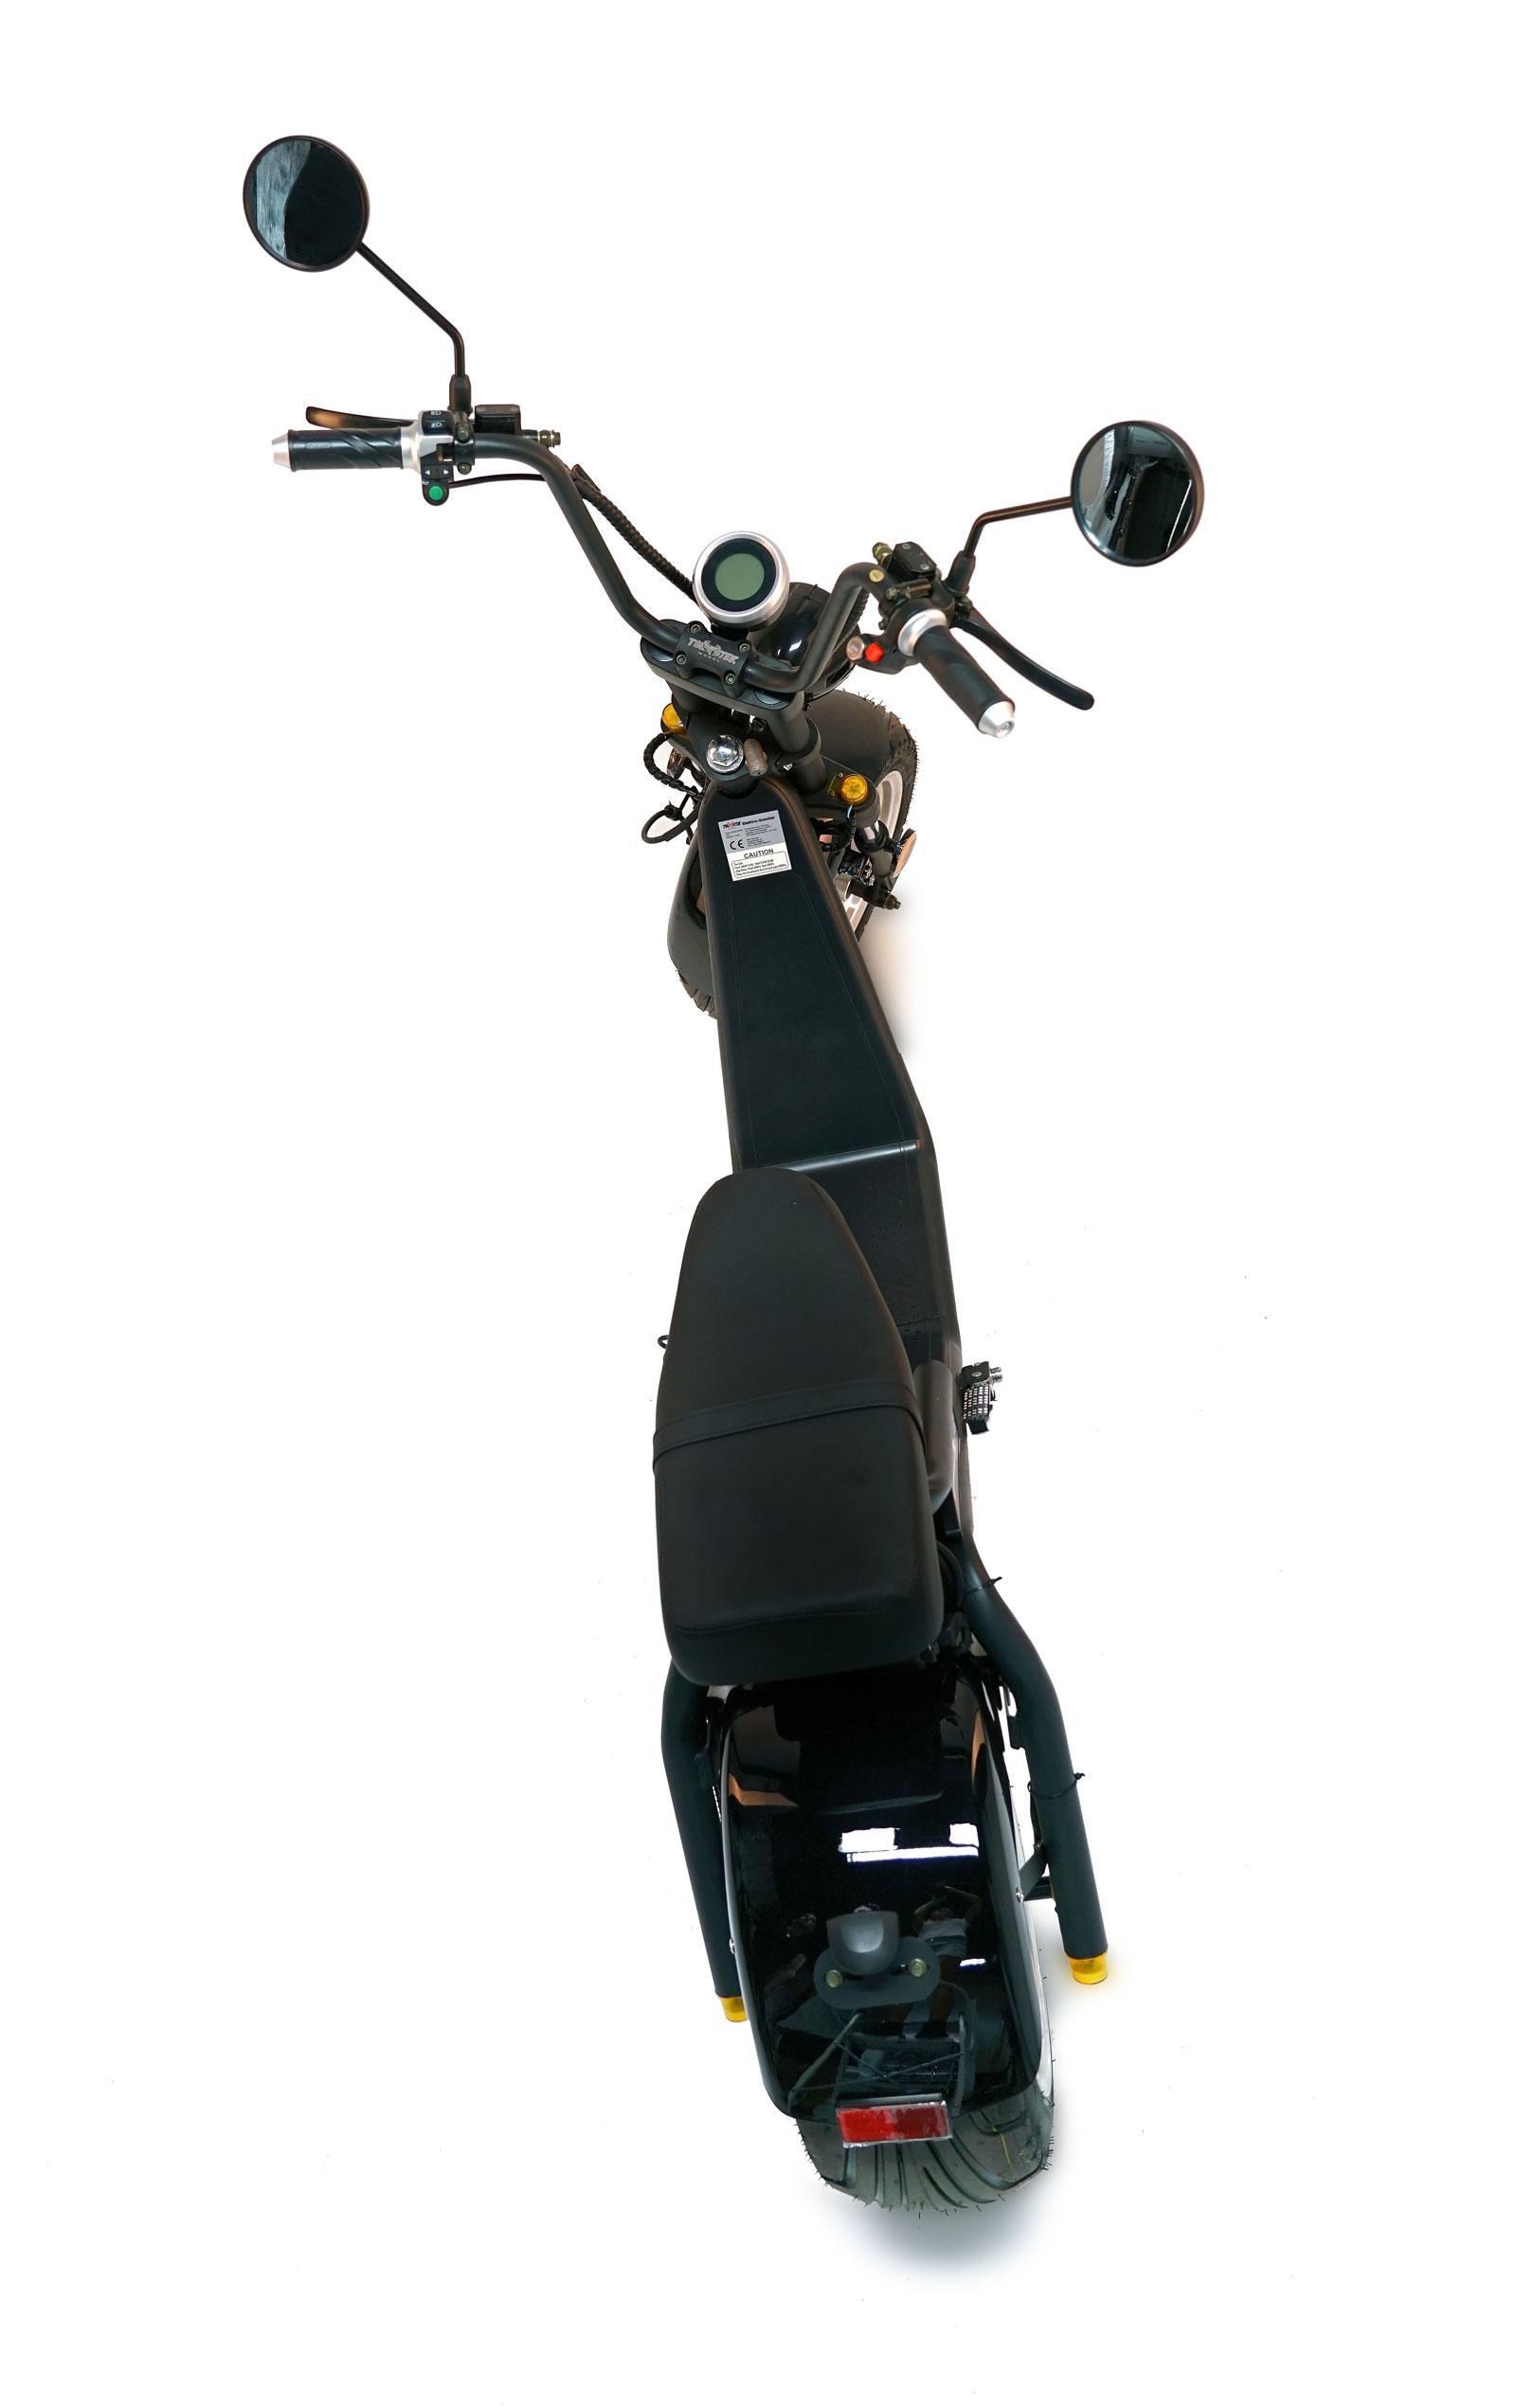 Elektro Roller 50 E Nova Motorroller Mofa Moped Lithium schwarz Bild 11